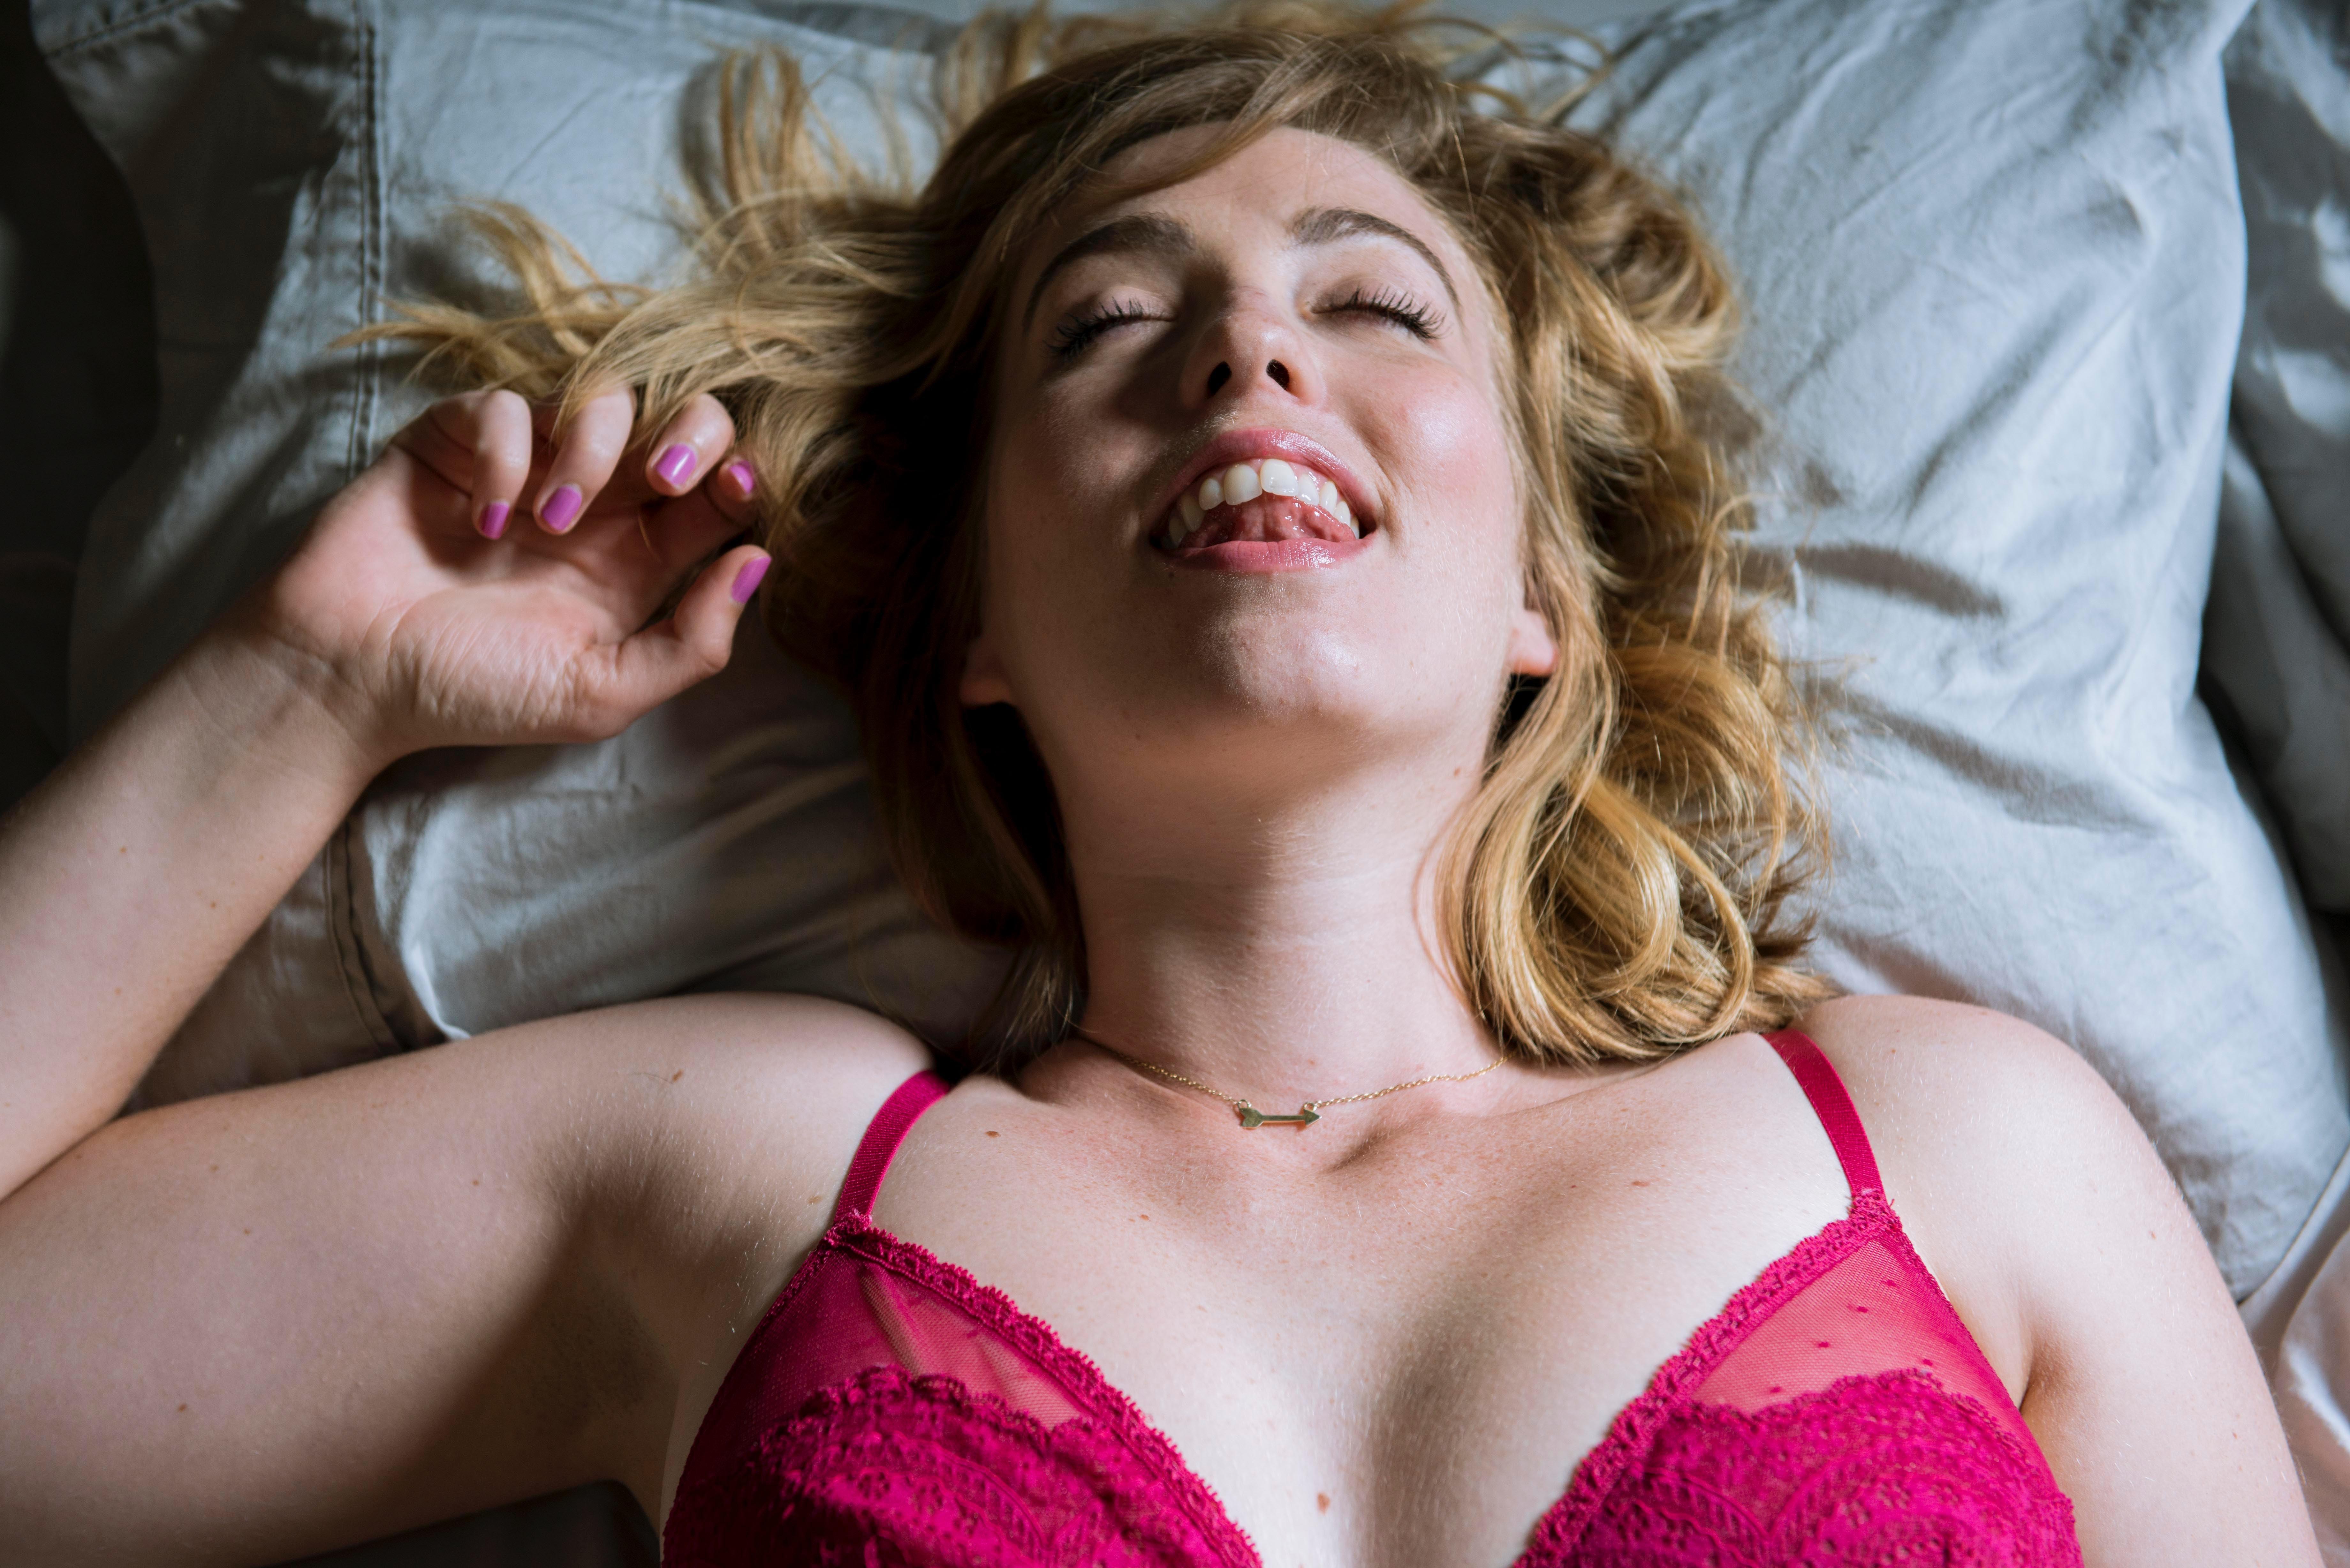 Achieve female masturbation multiple orgasms real